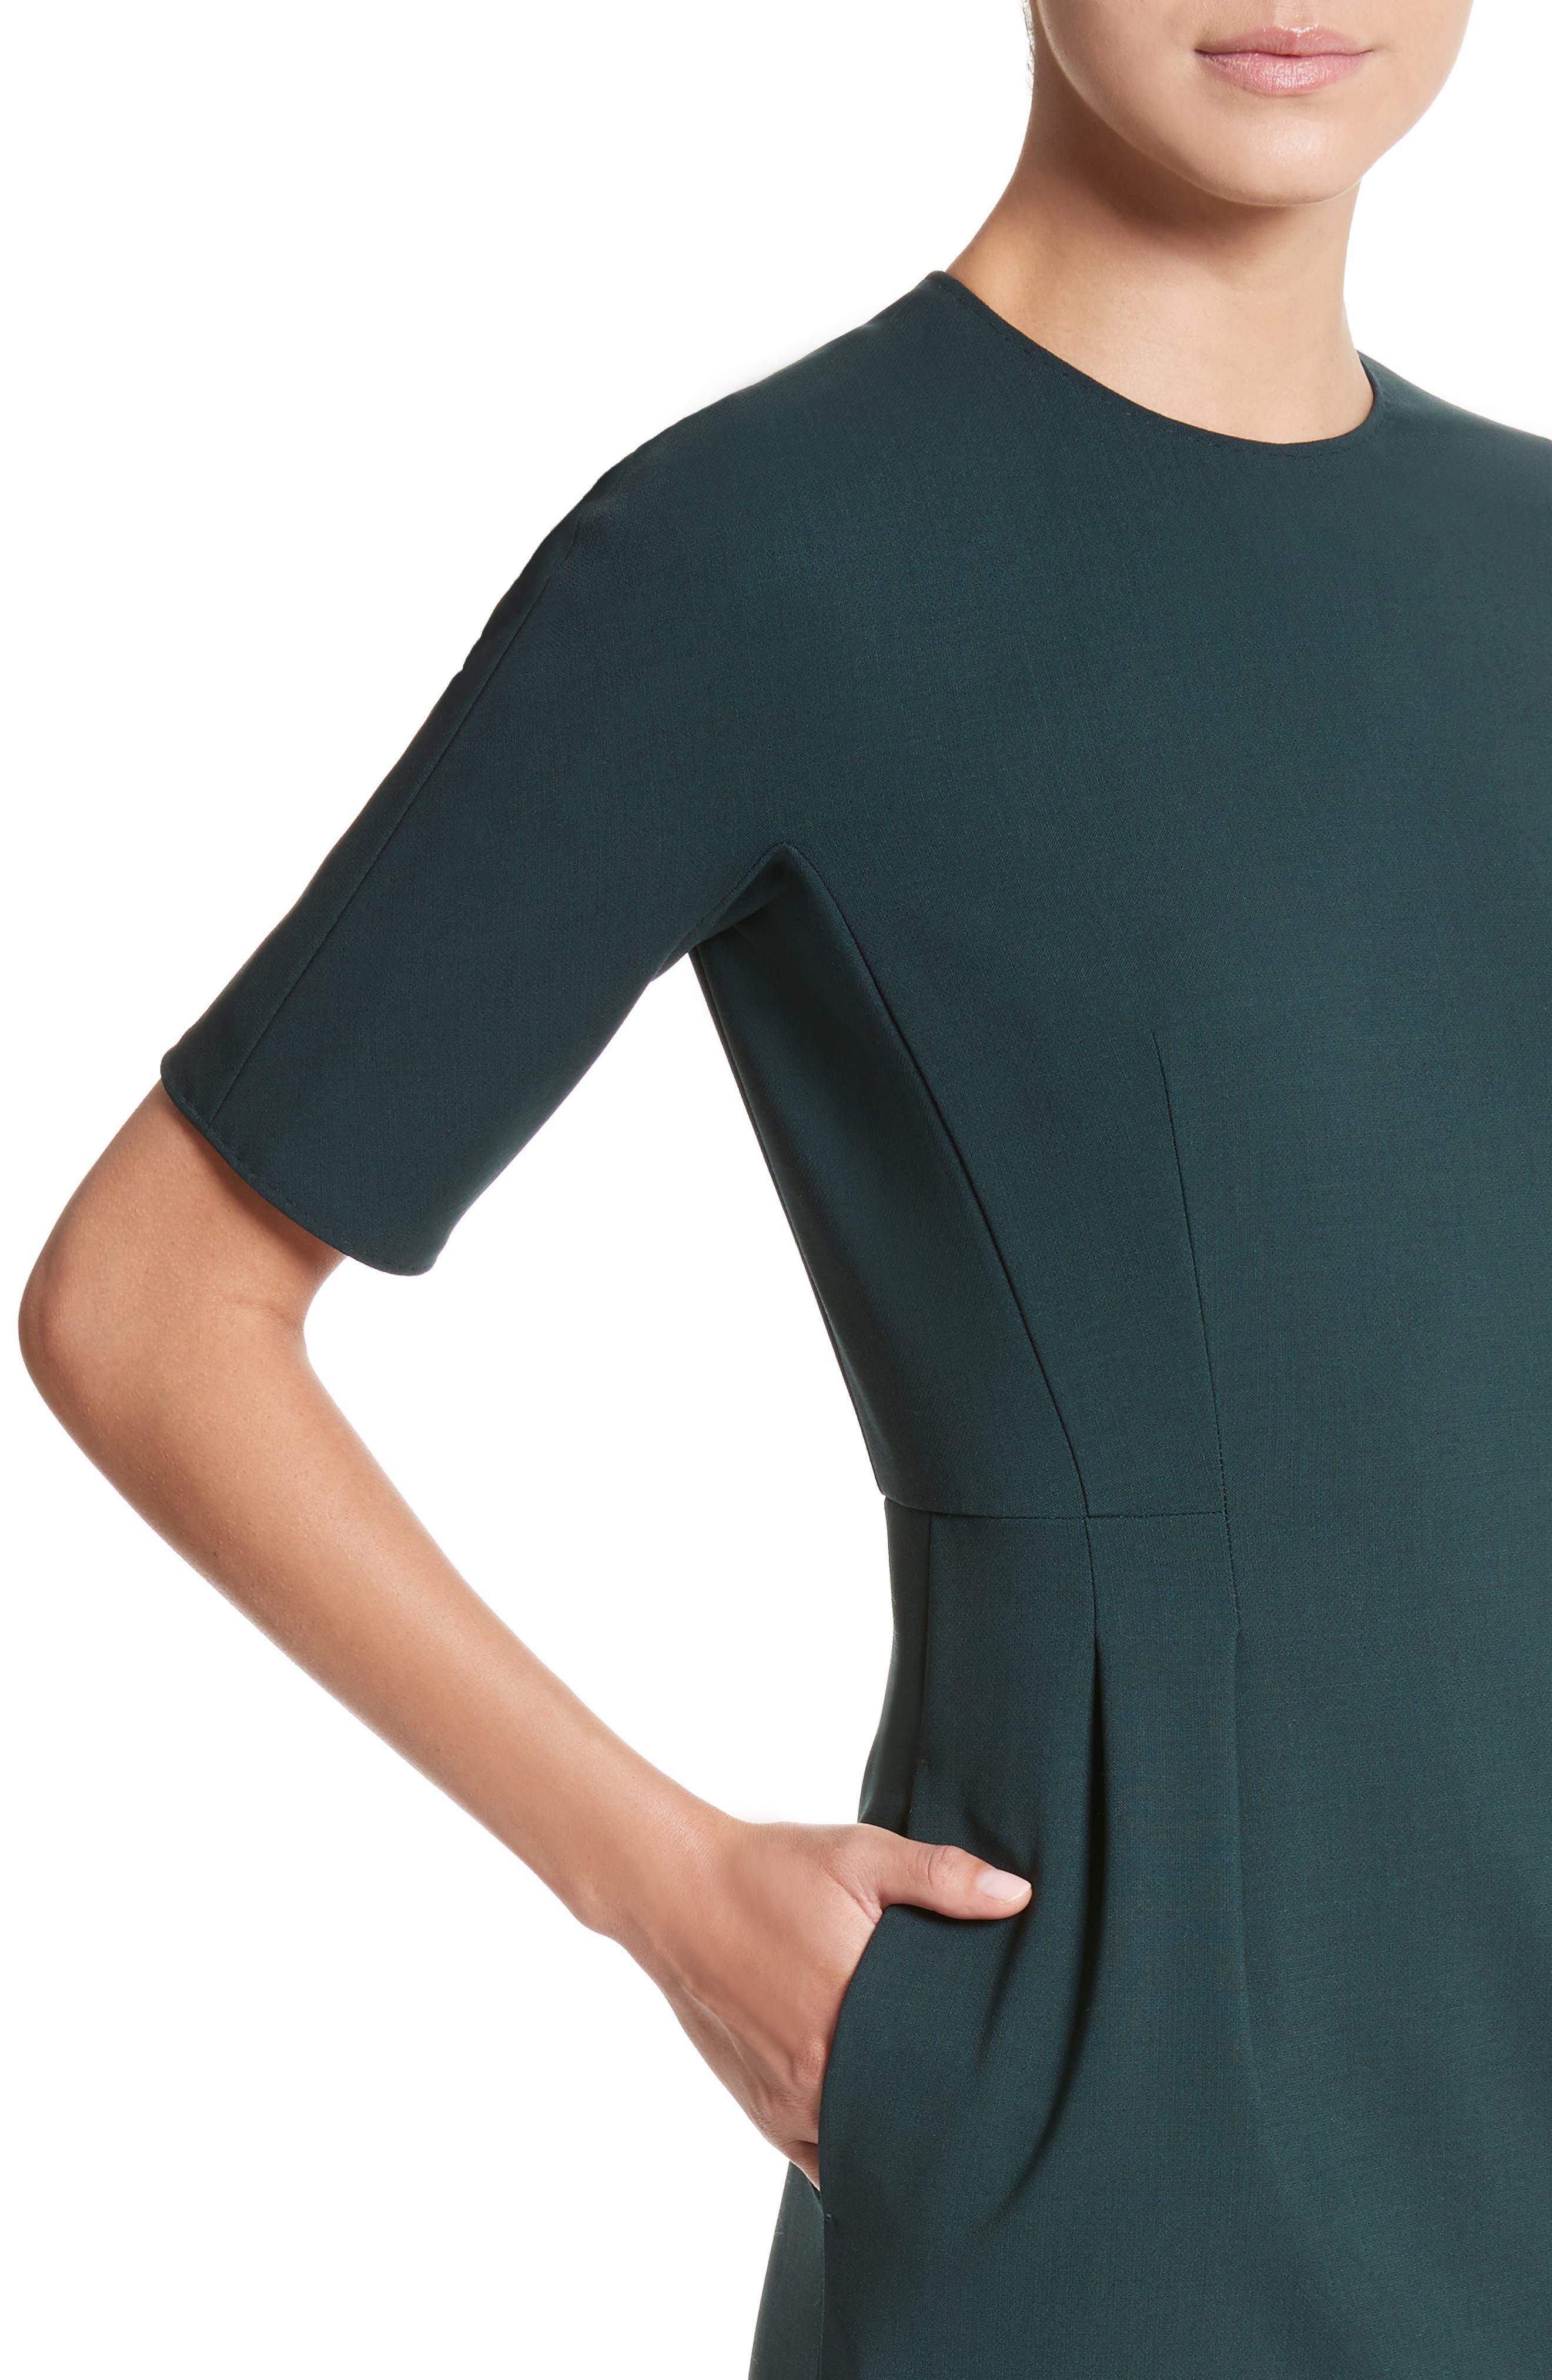 Umano Stretch Wool Sheath Dress,                             Alternate thumbnail 4, color,                             Dark Green